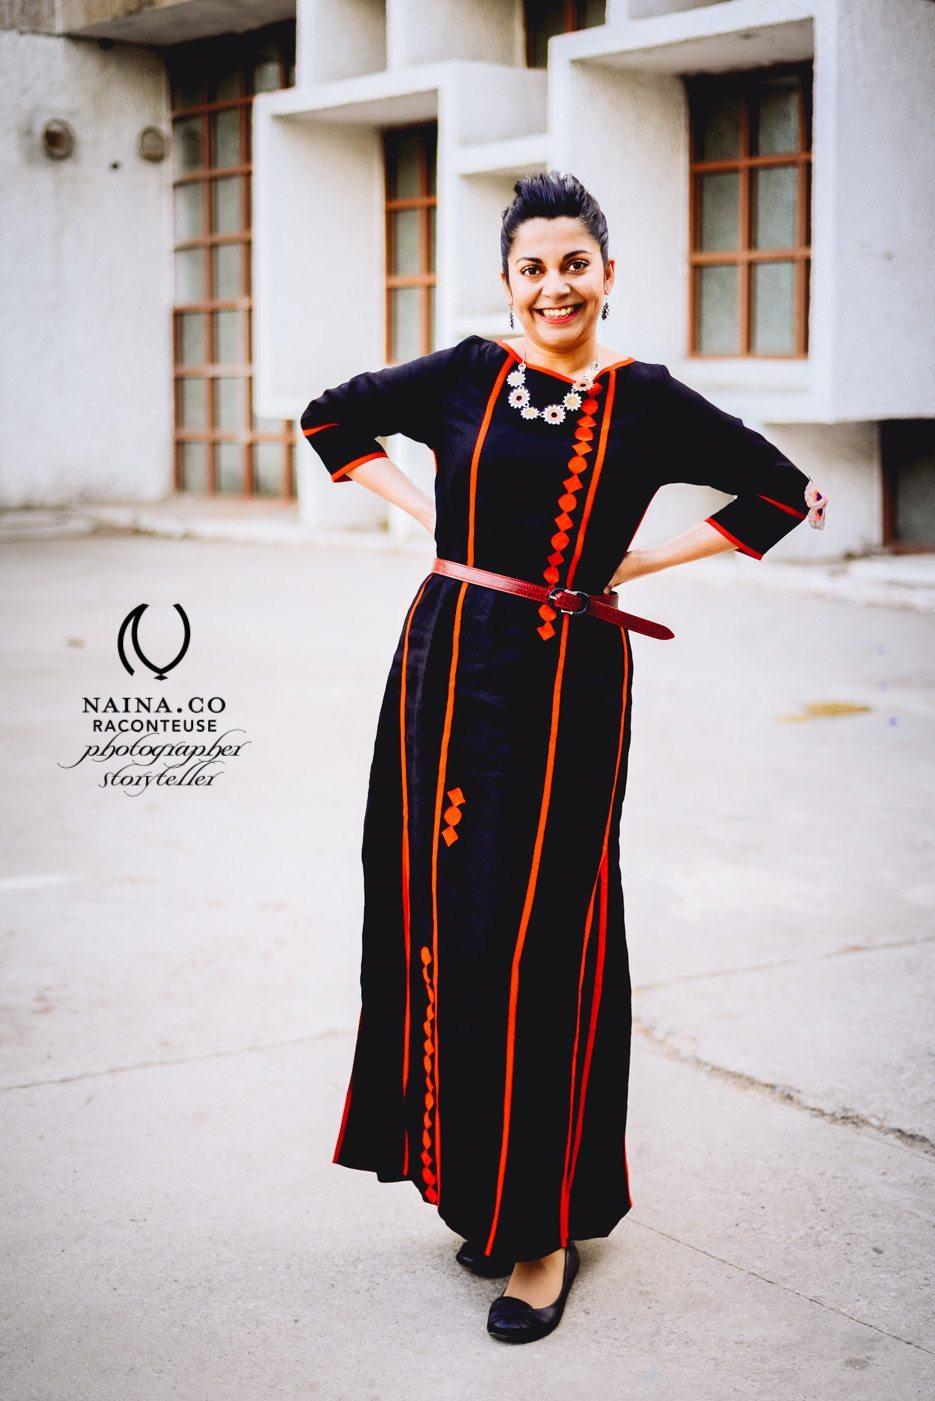 Fiama-Naina-Akanksha-WIFWAW14-Wendell-Rodricks-CoverUp-11-Raconteuse-Storyteller-Photographer-Naina.co-01